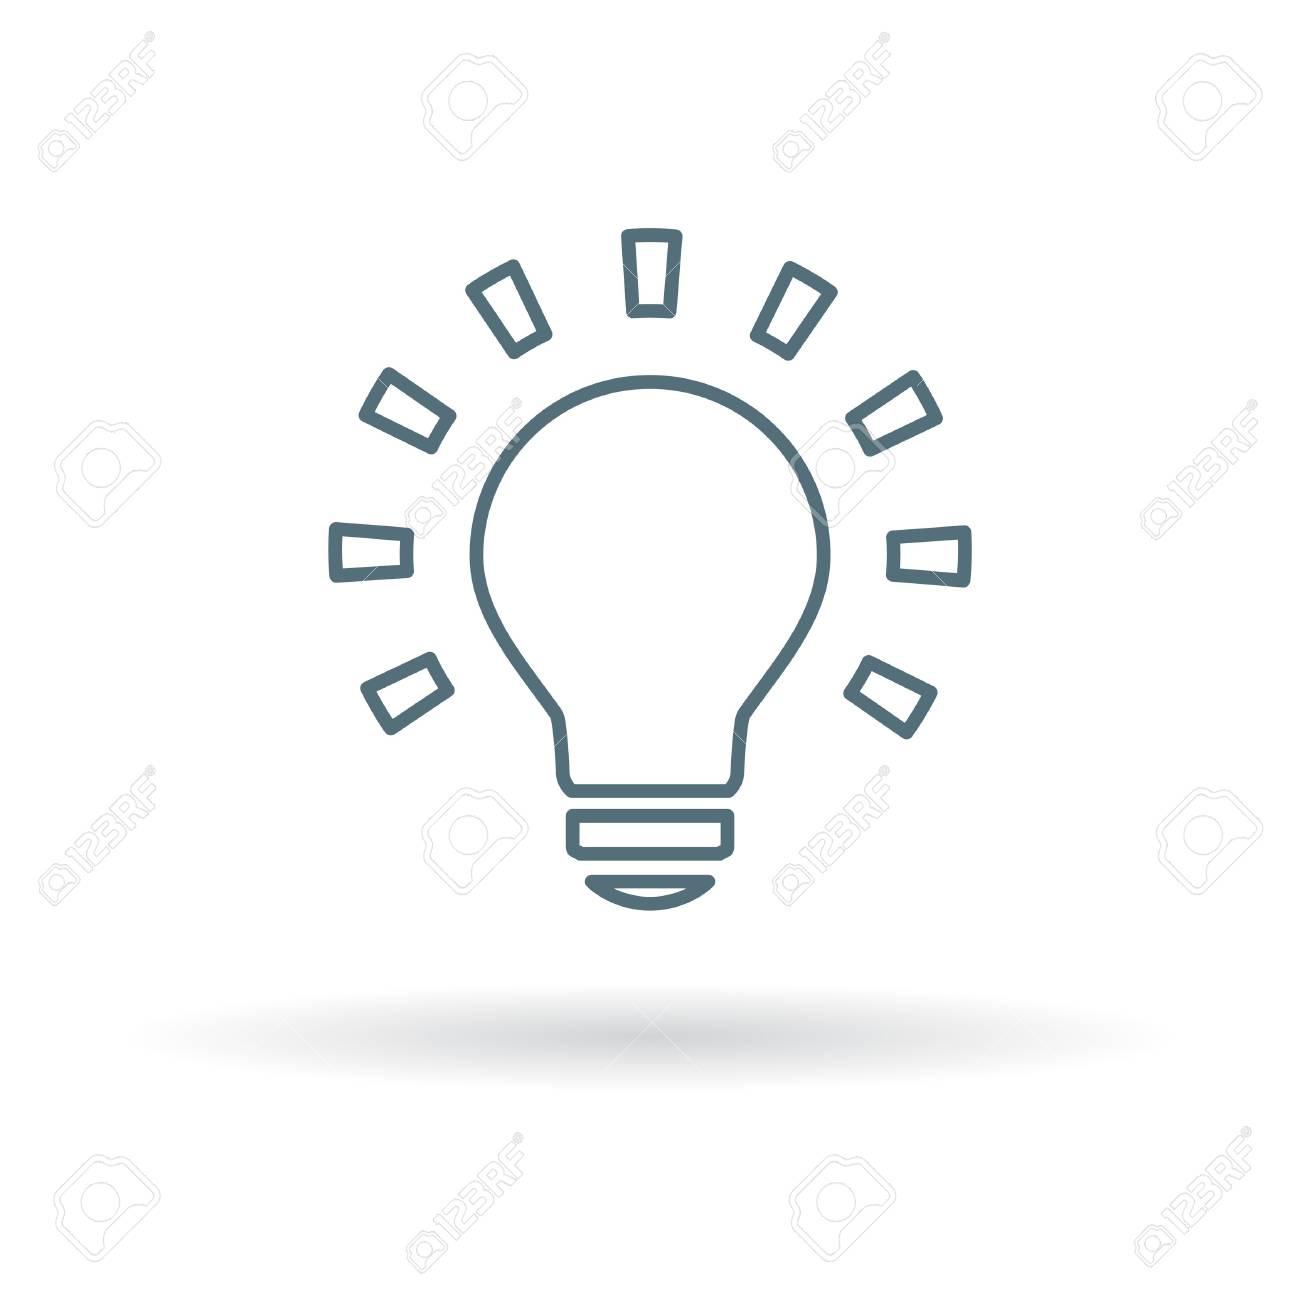 Lightbulb icon  Lightbulb sign  Lightbulb symbol  Thin line icon